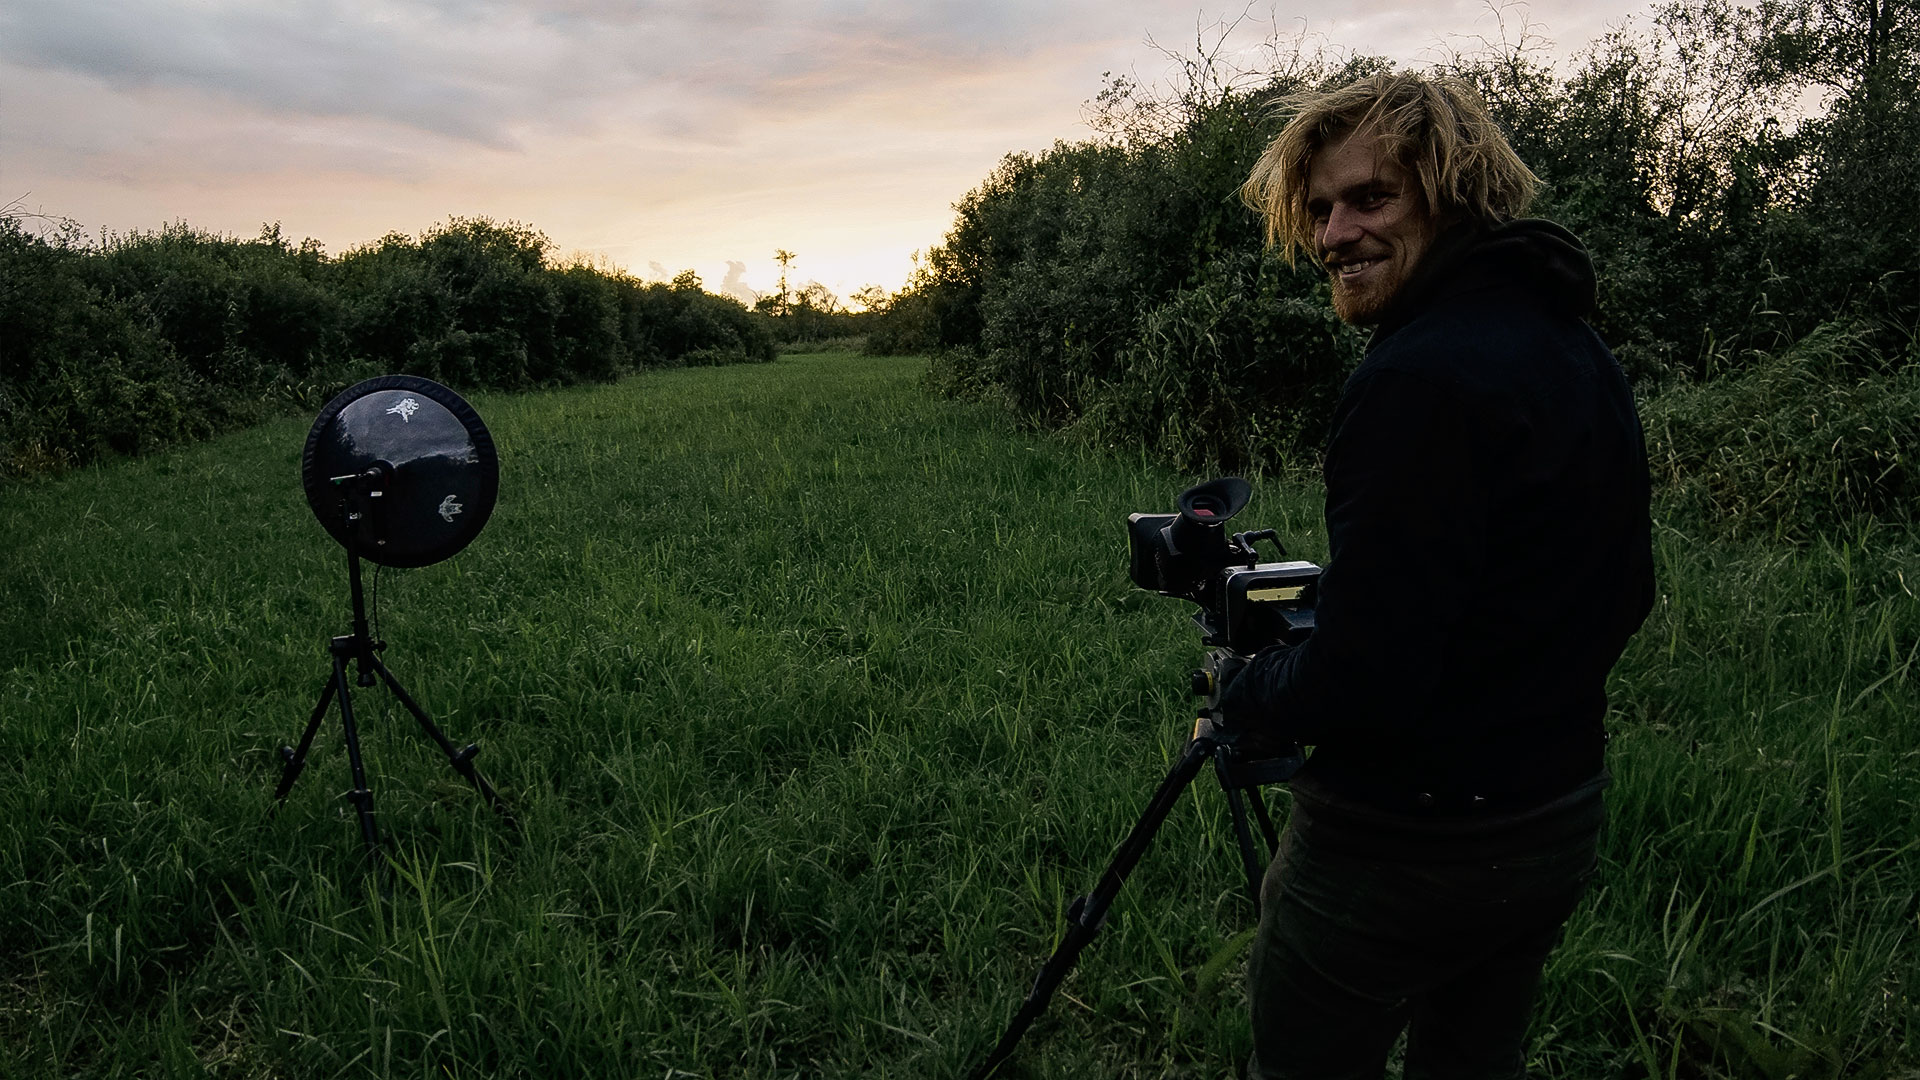 BMCC-filming